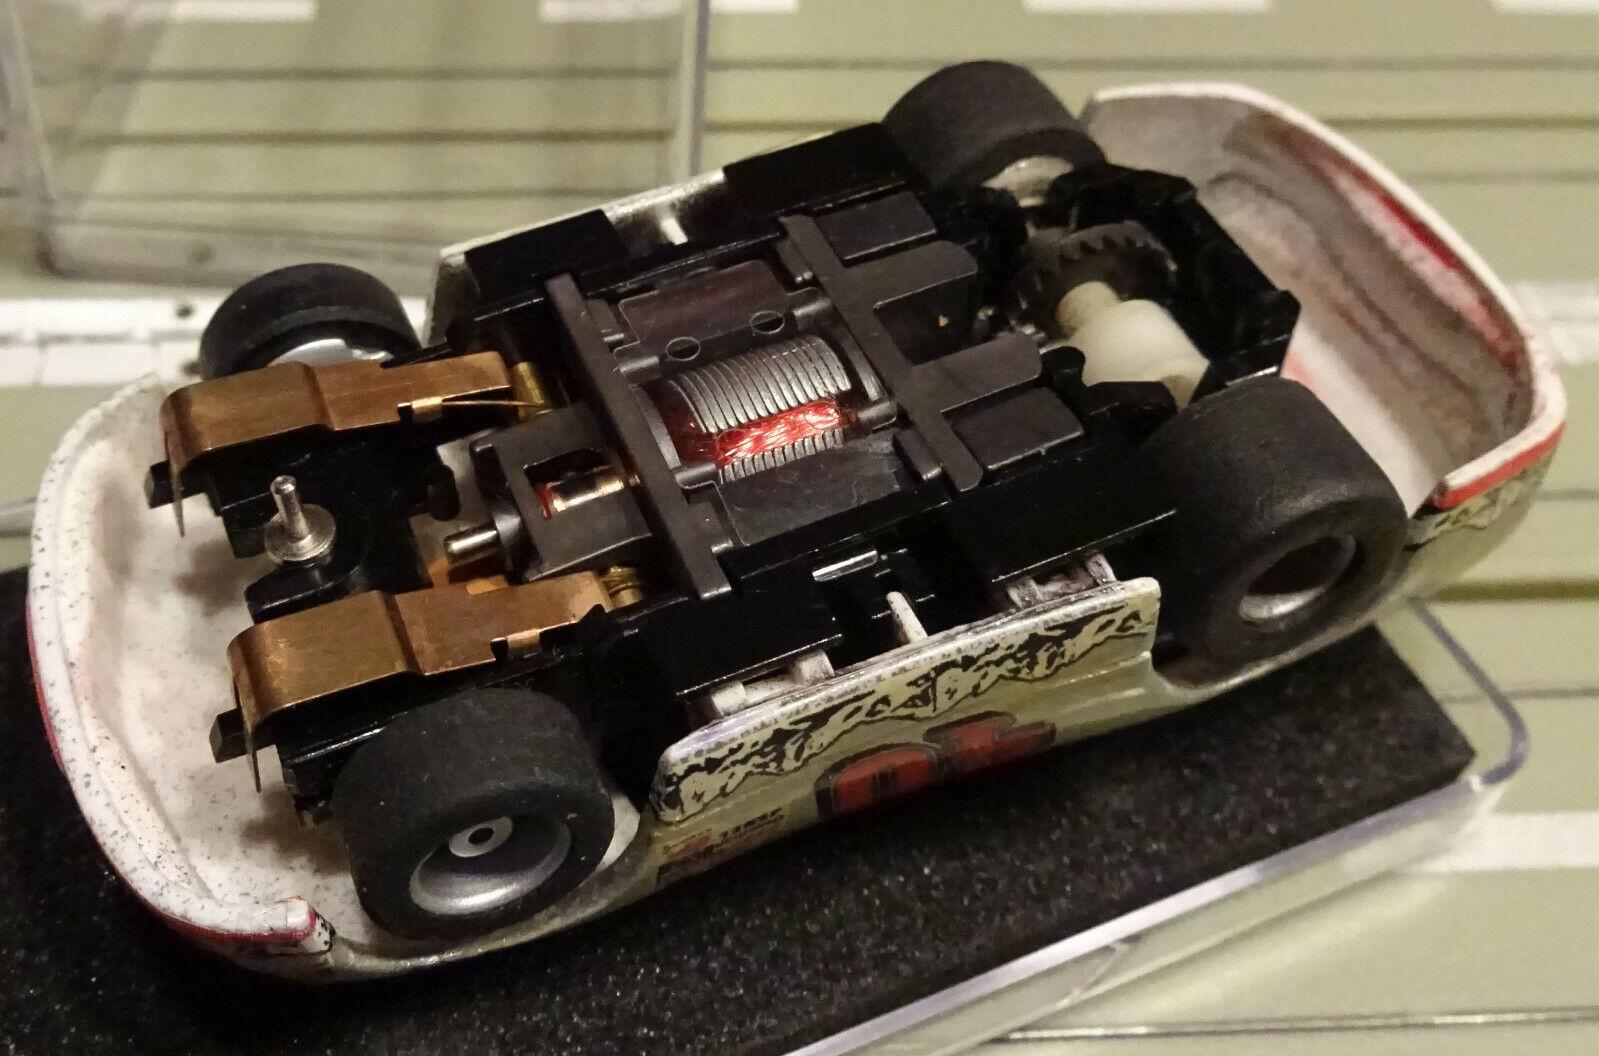 Para H0 Coche Coche Coche Slot Racing Maqueta de Tren Ford Nascar con Tyco el Motor a2cc20